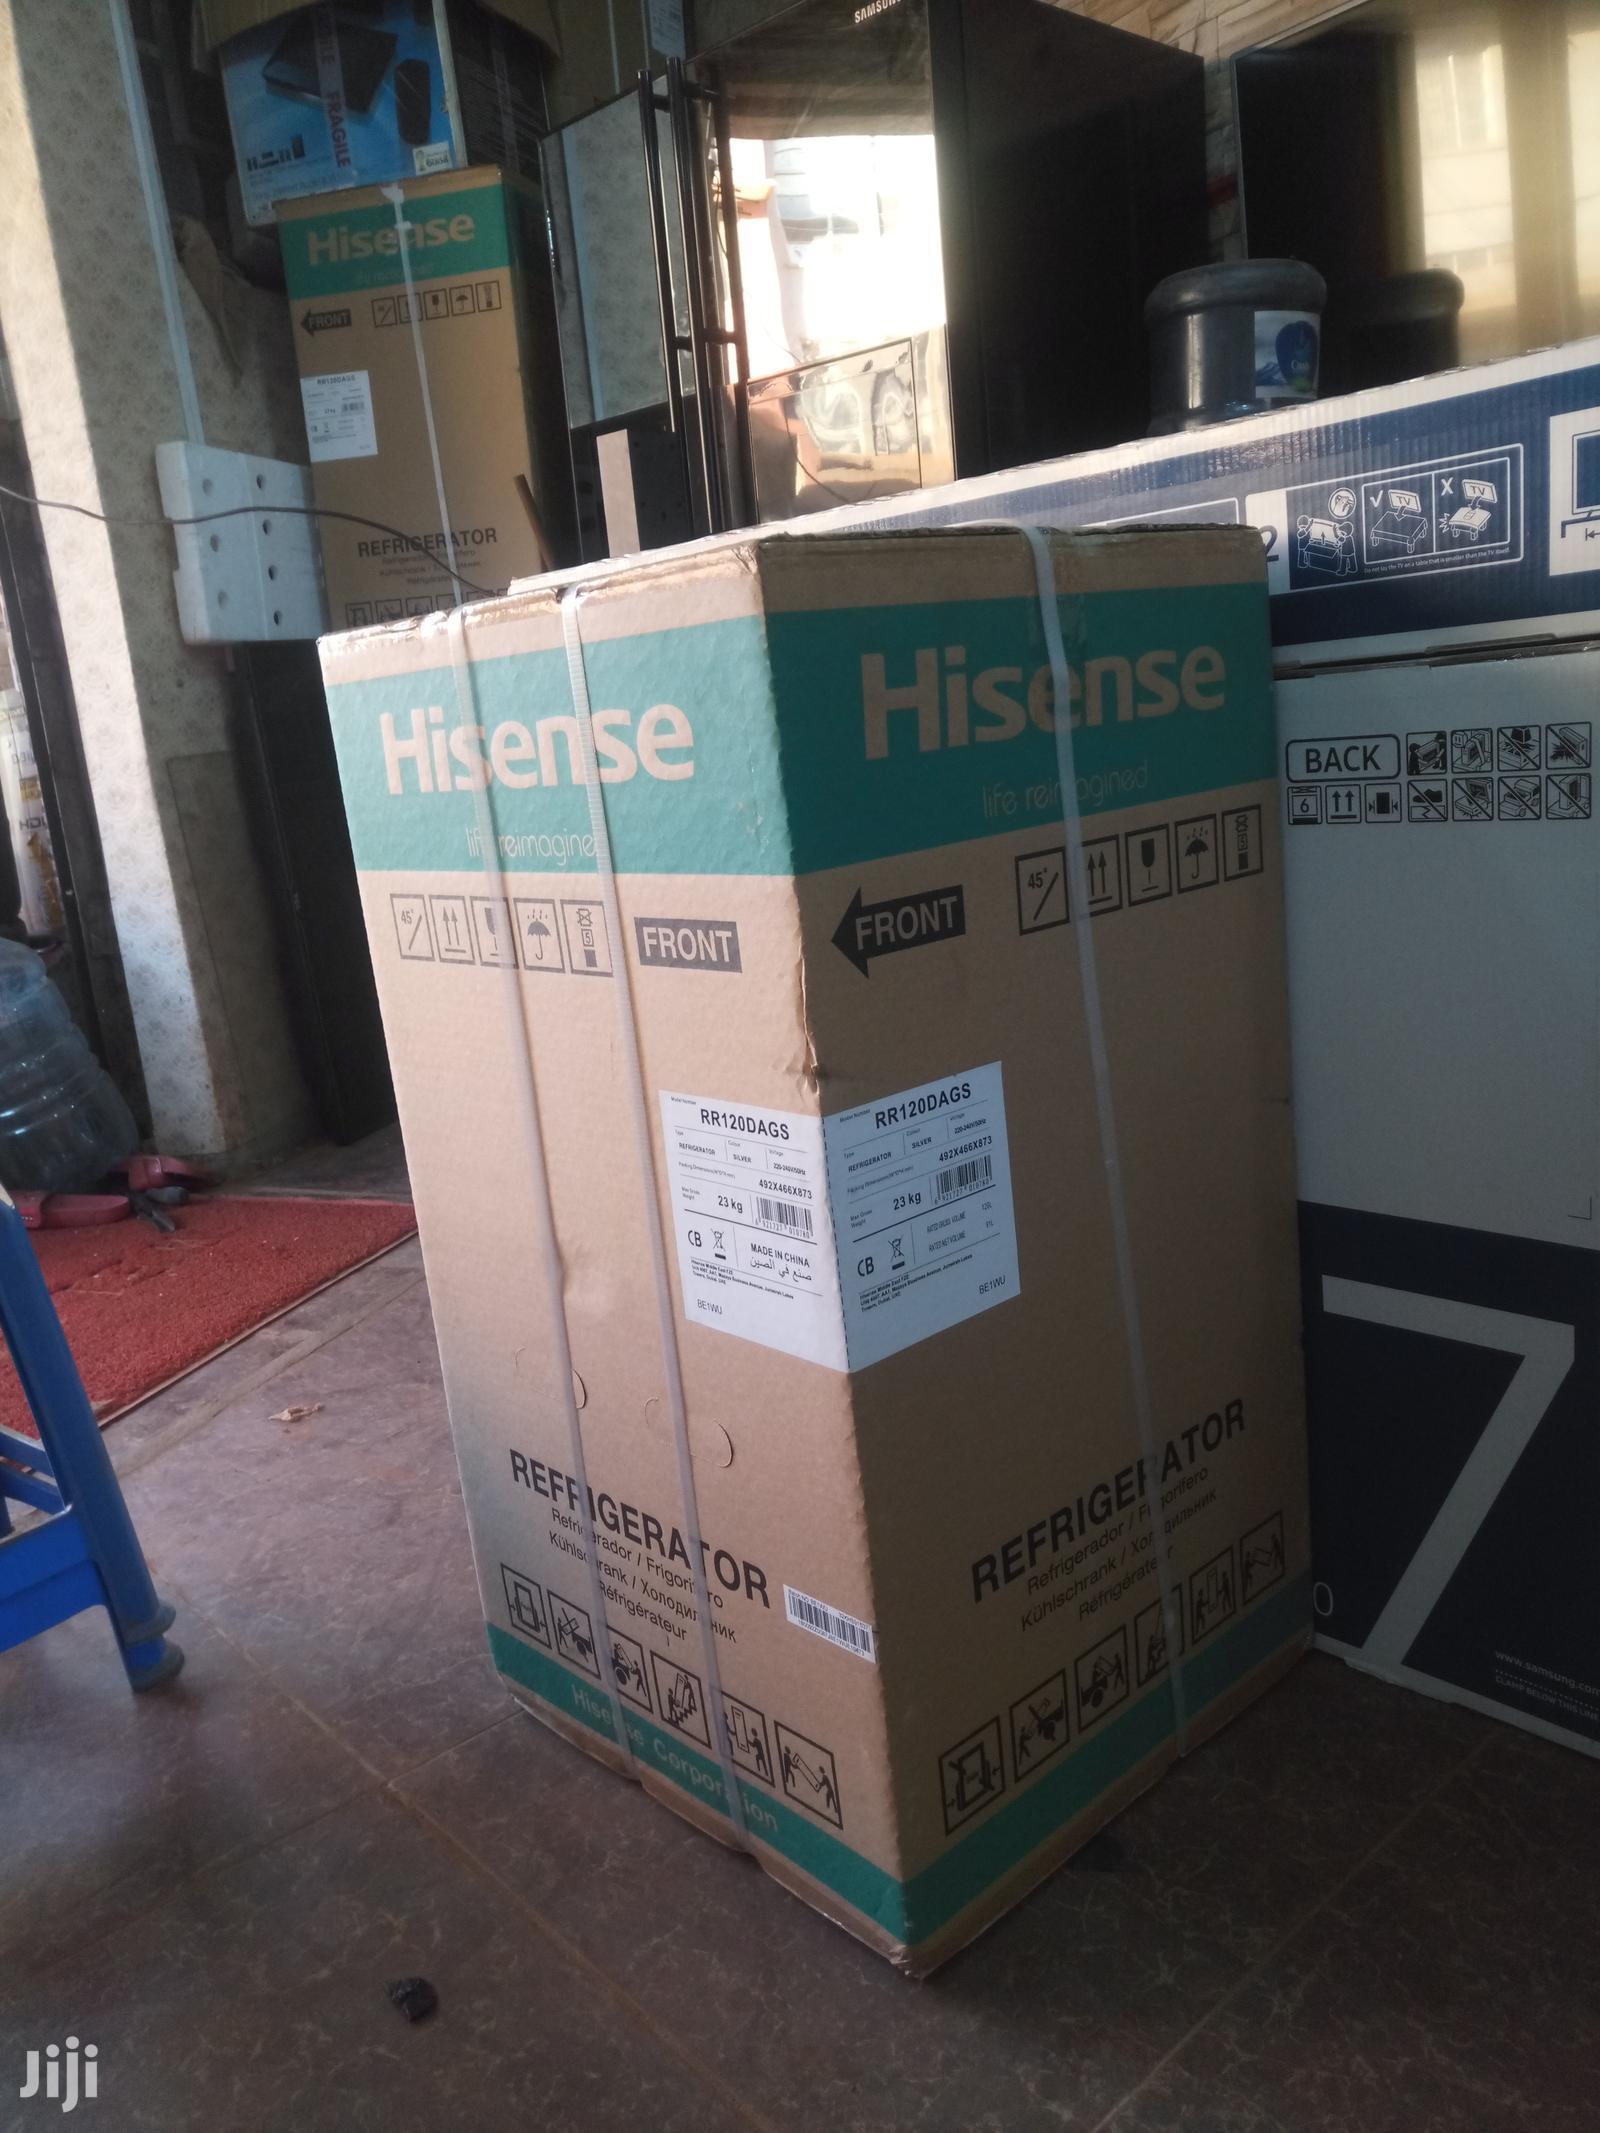 Hisense 120L Refrigerator